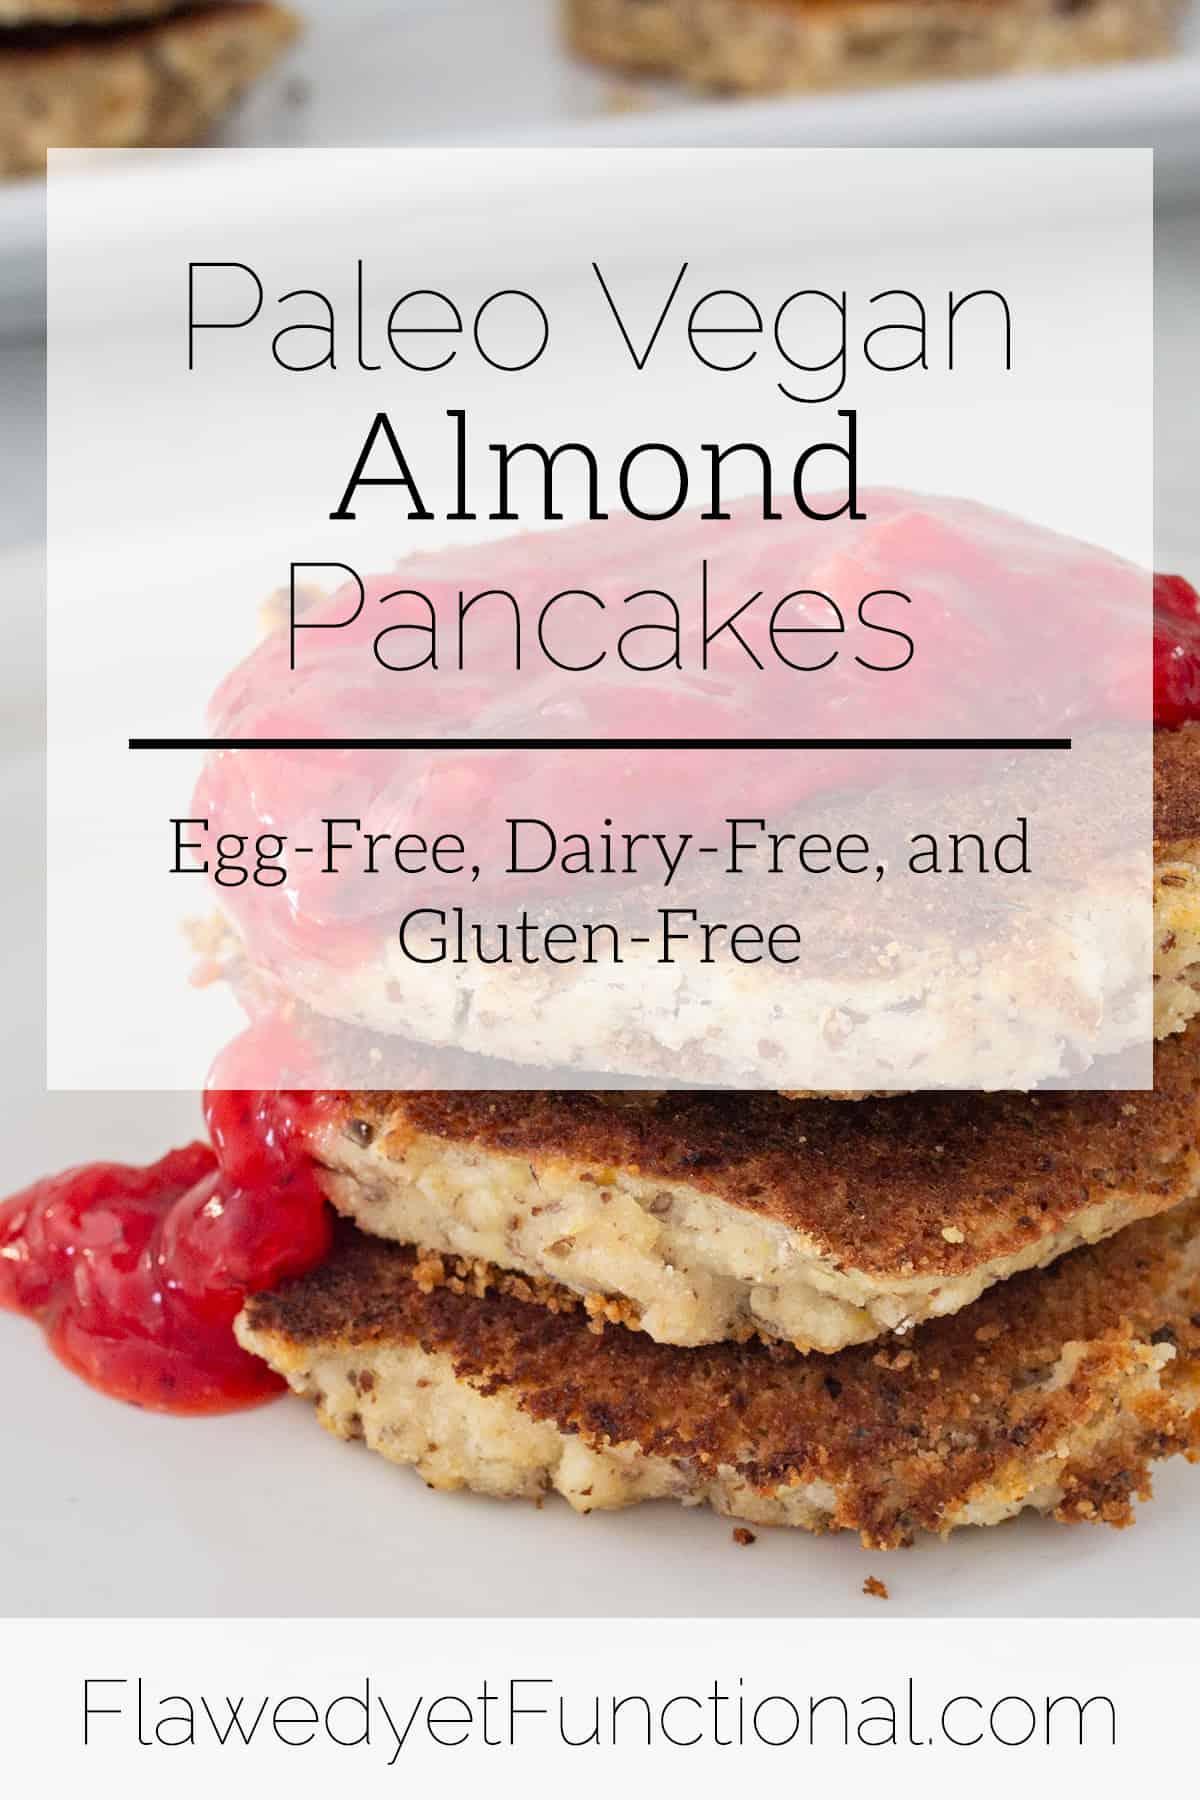 Paleo Vegan Almond Pancakes   Egg-Free, Dairy-Free, Gluten-Free, Grain-Free